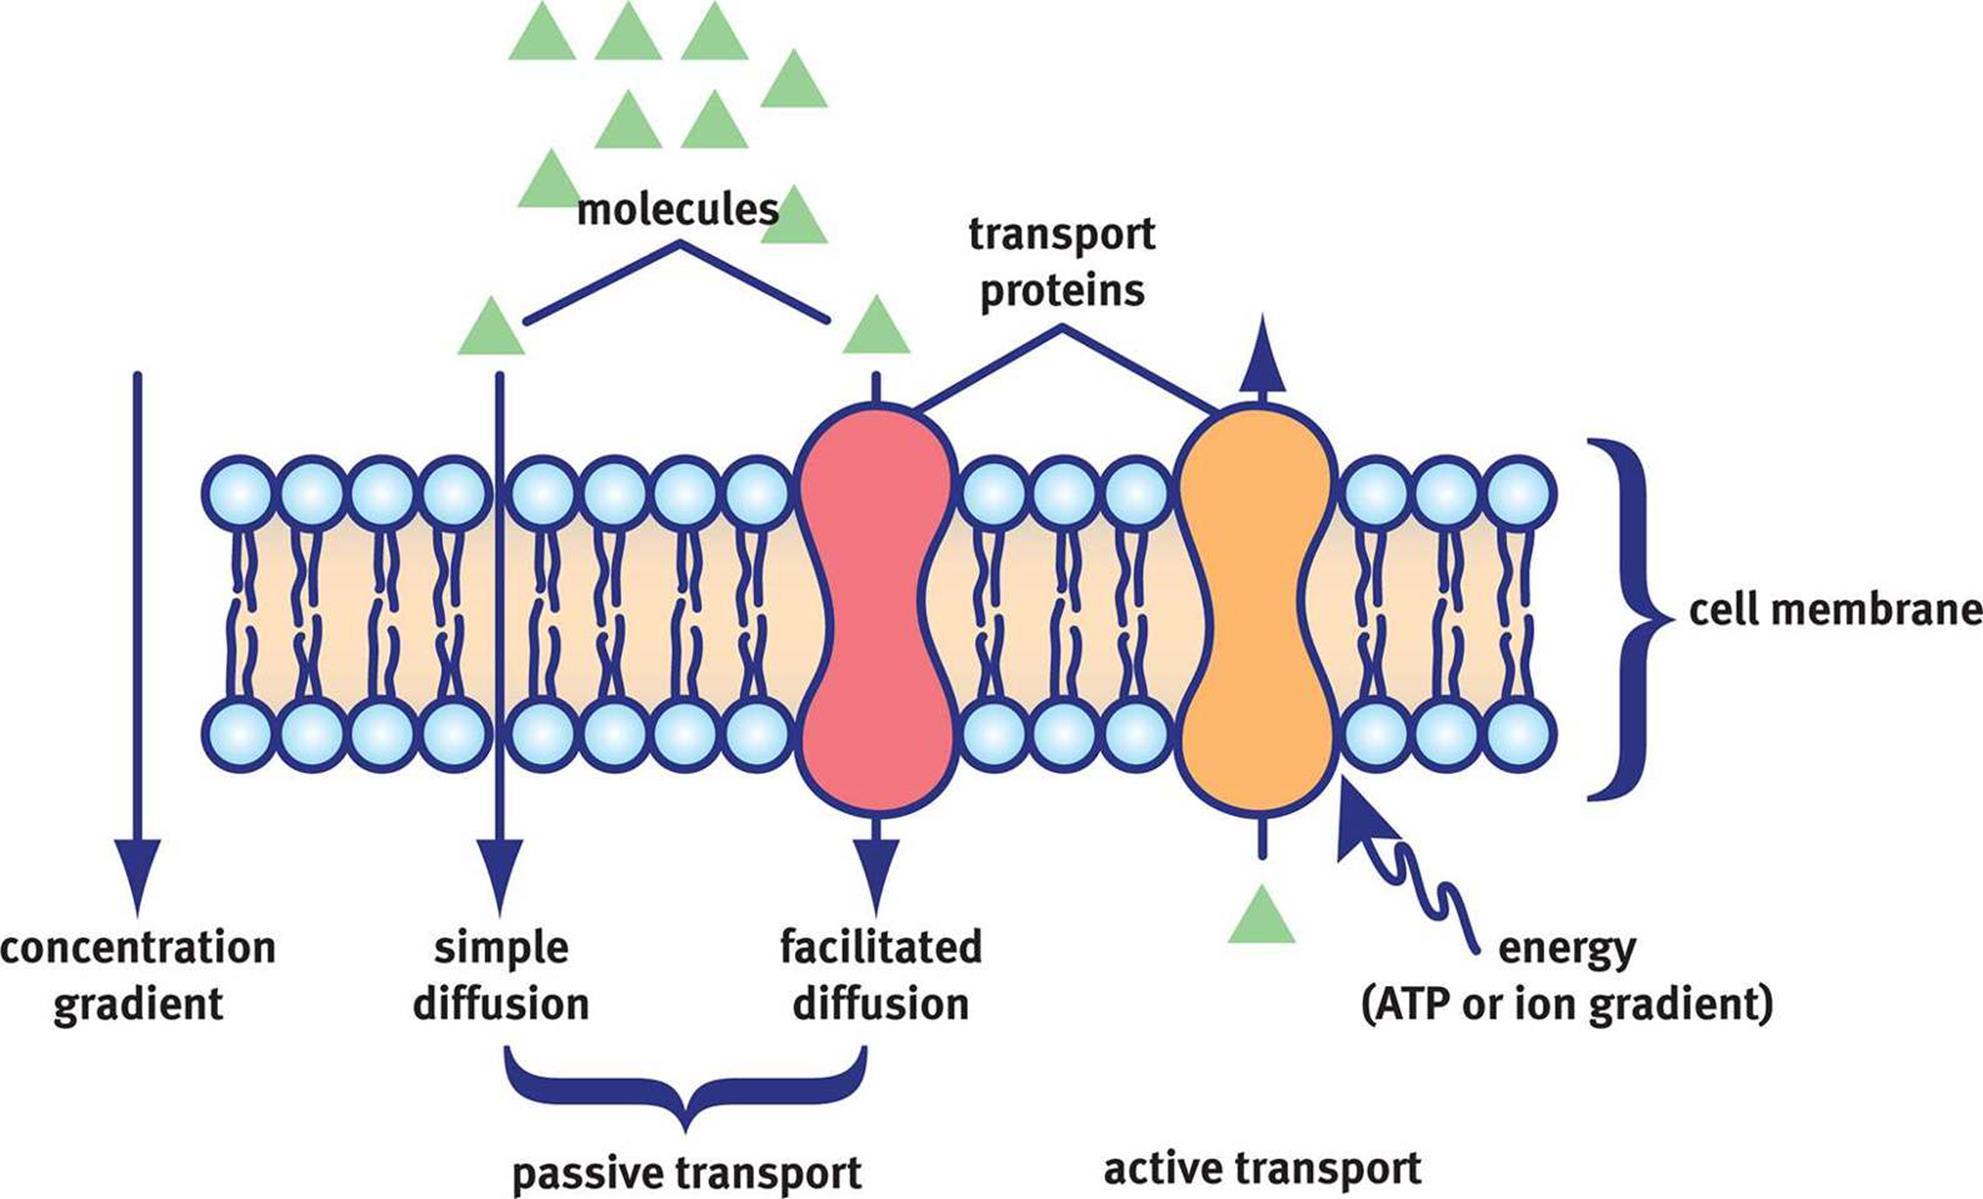 http://schoolbag.info/chemistry/mcat_biochemistry/49.html